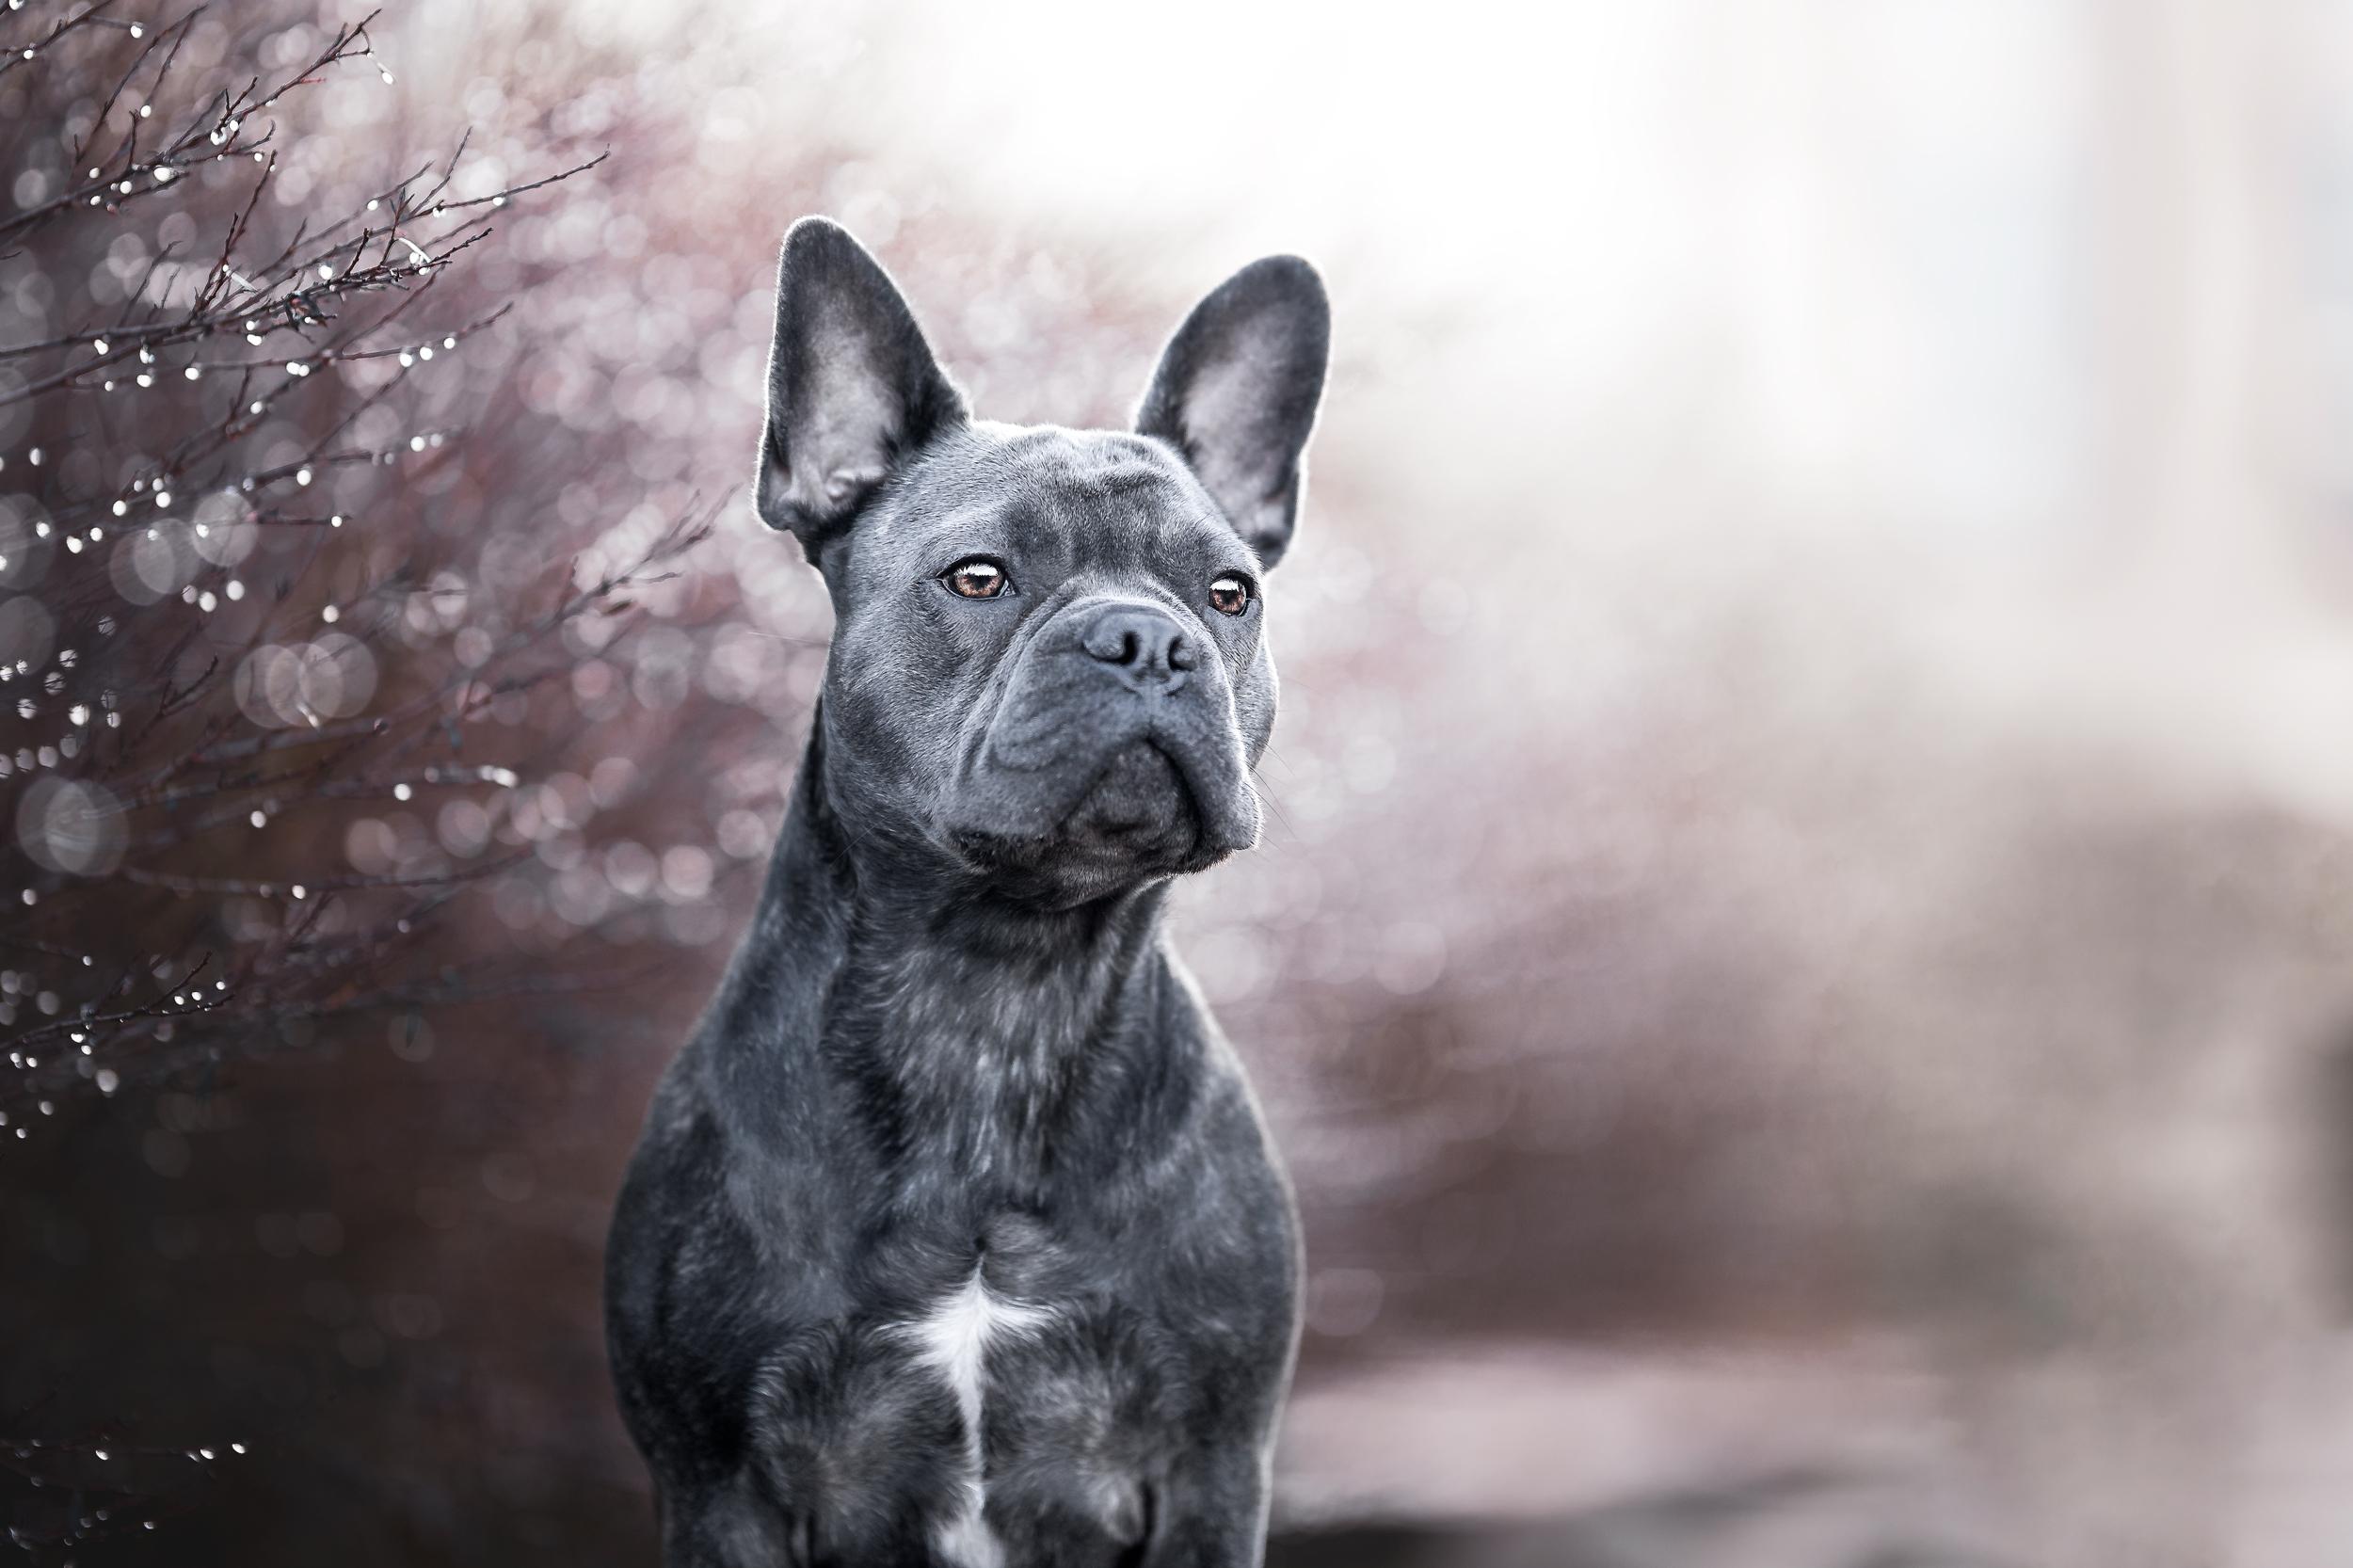 Hundefotografie Schweiz: Franzoesische Bulldogge in Rheinfelden Schweiz Photo-Passion